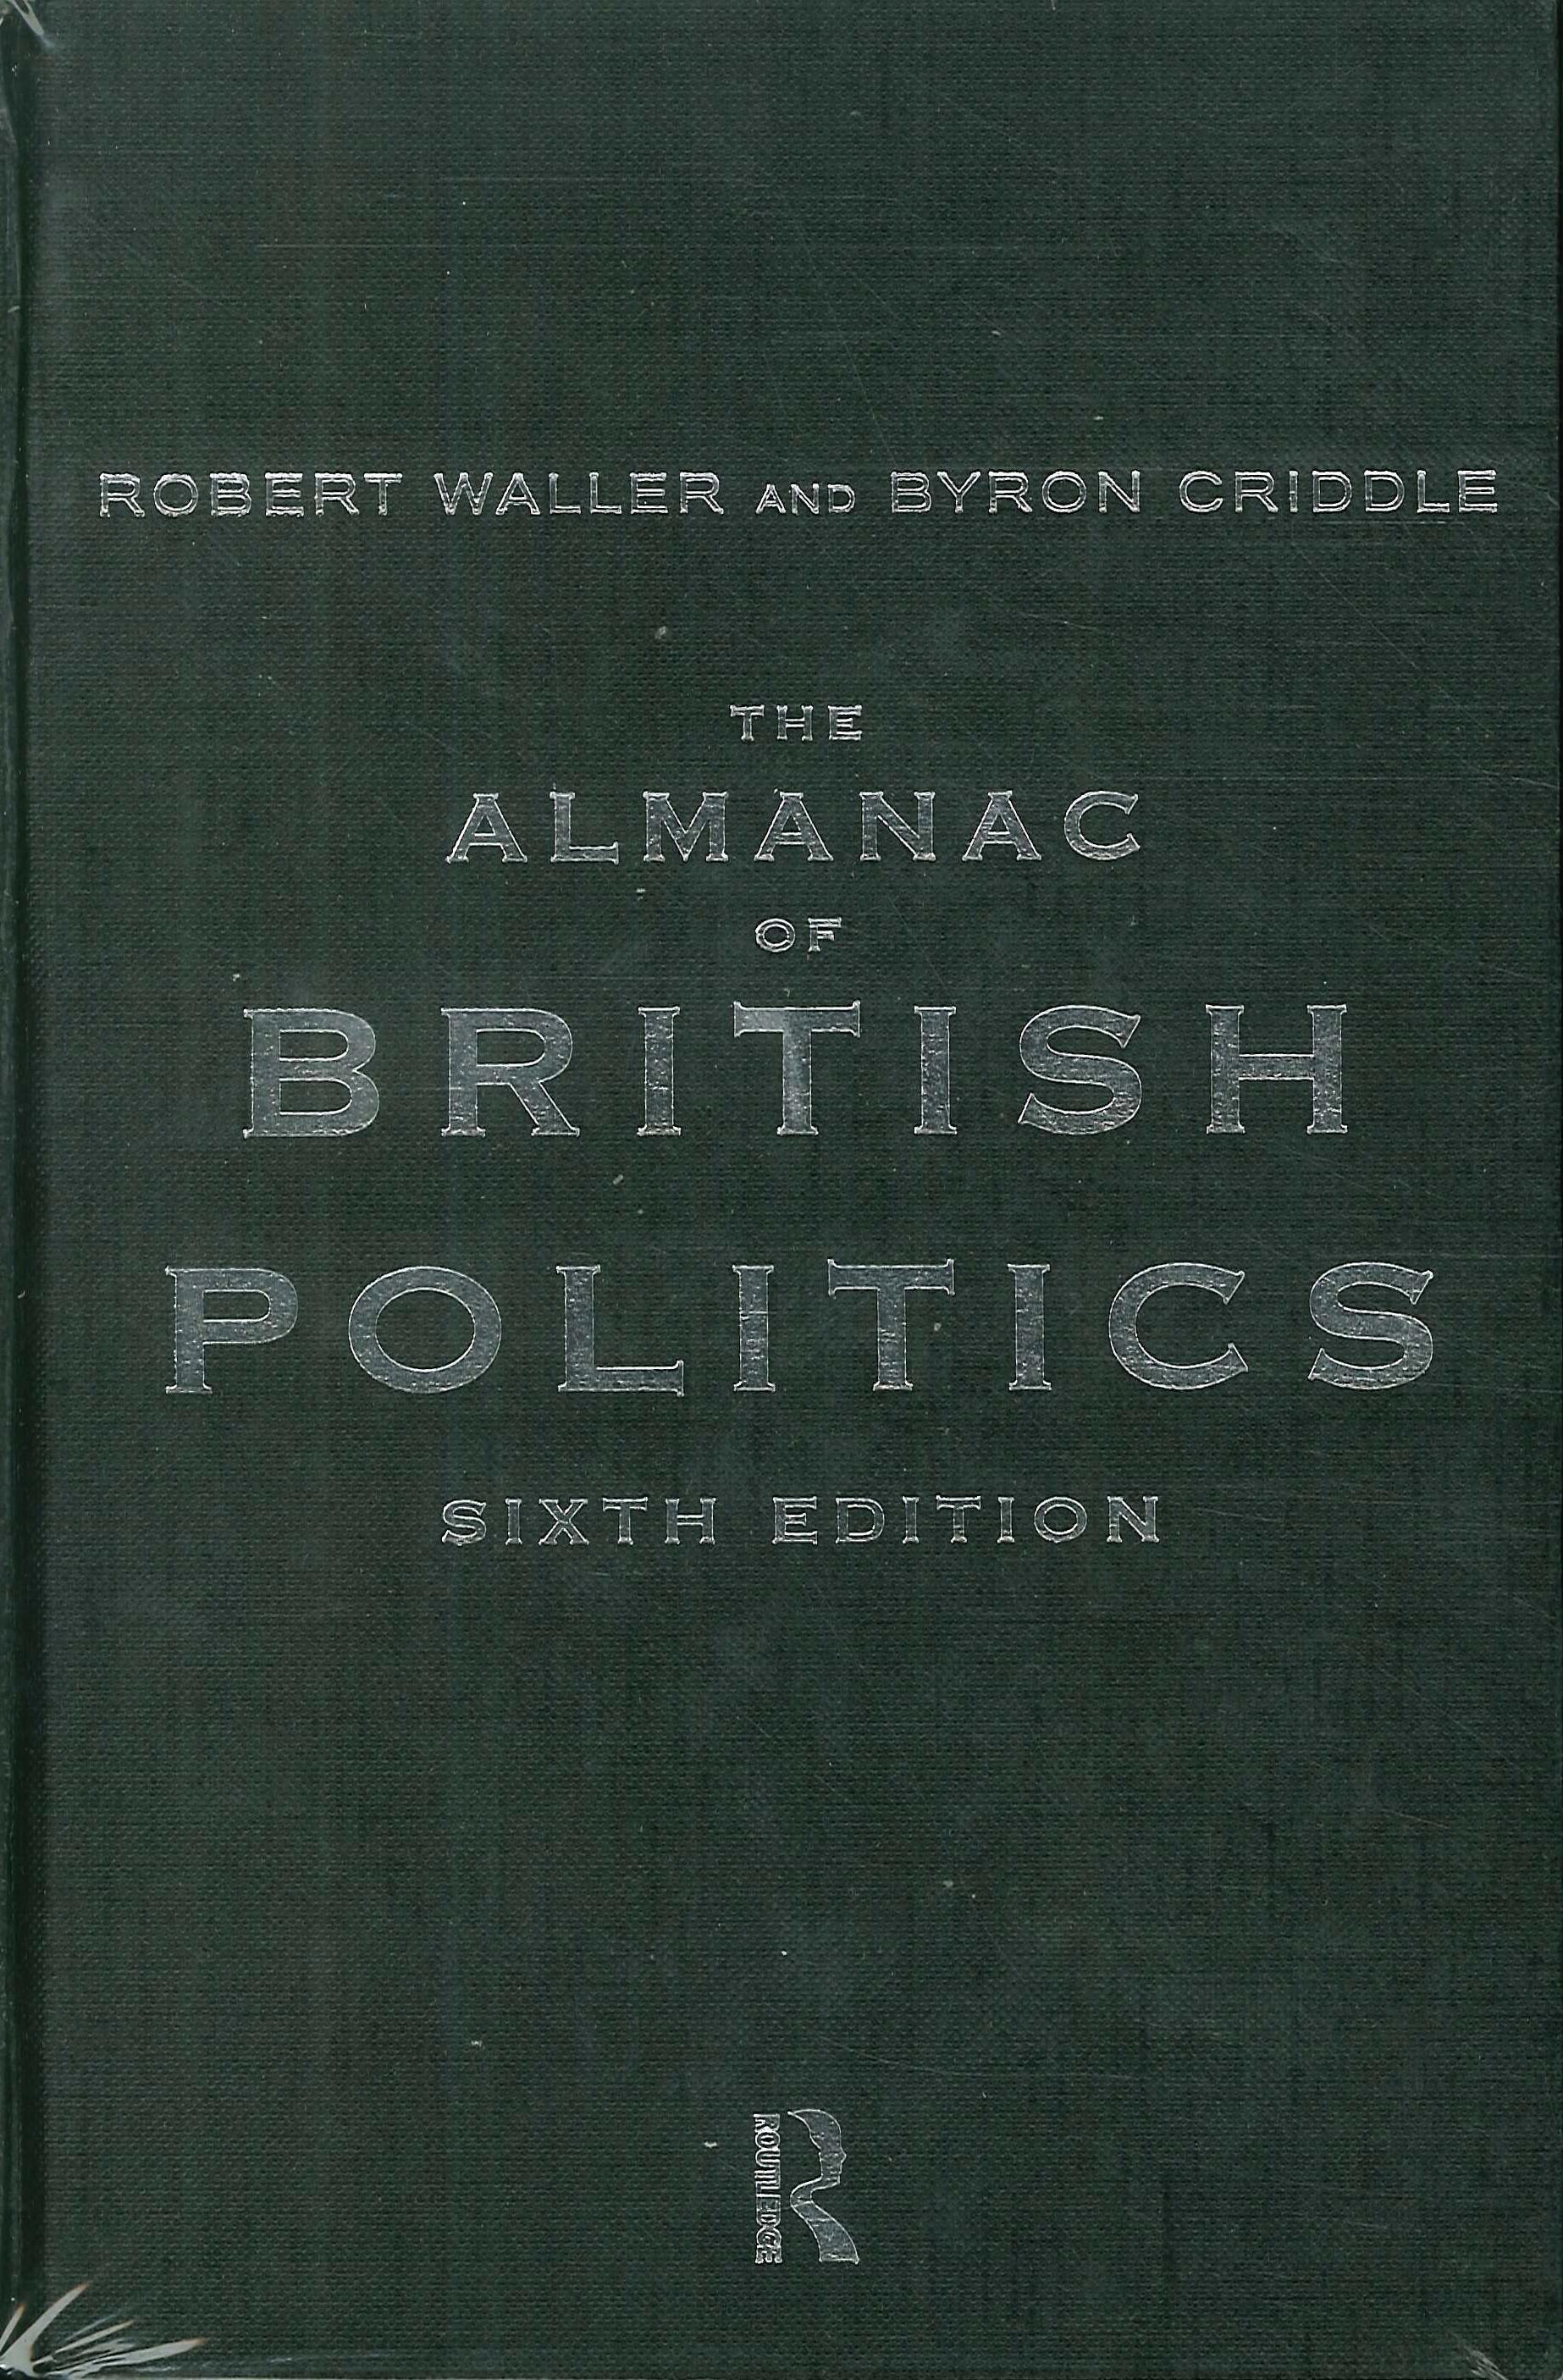 The Almanac of British Politics. Sixth Edition